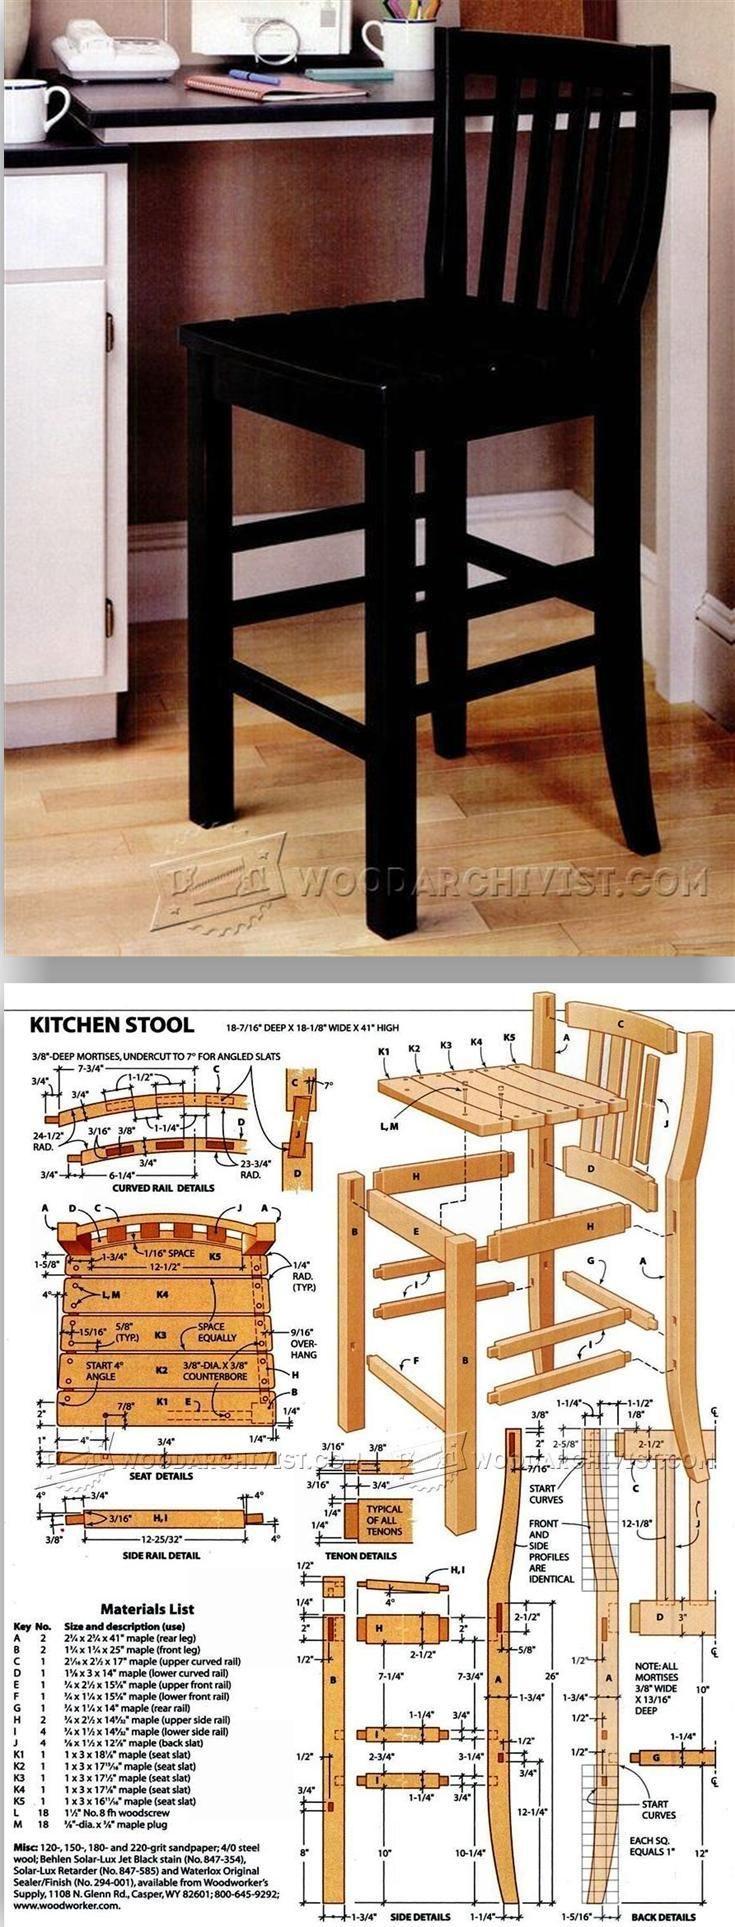 Morris chair plans - Kitchen Stool Plans Furniture Plans And Projects Woodarchivist Com